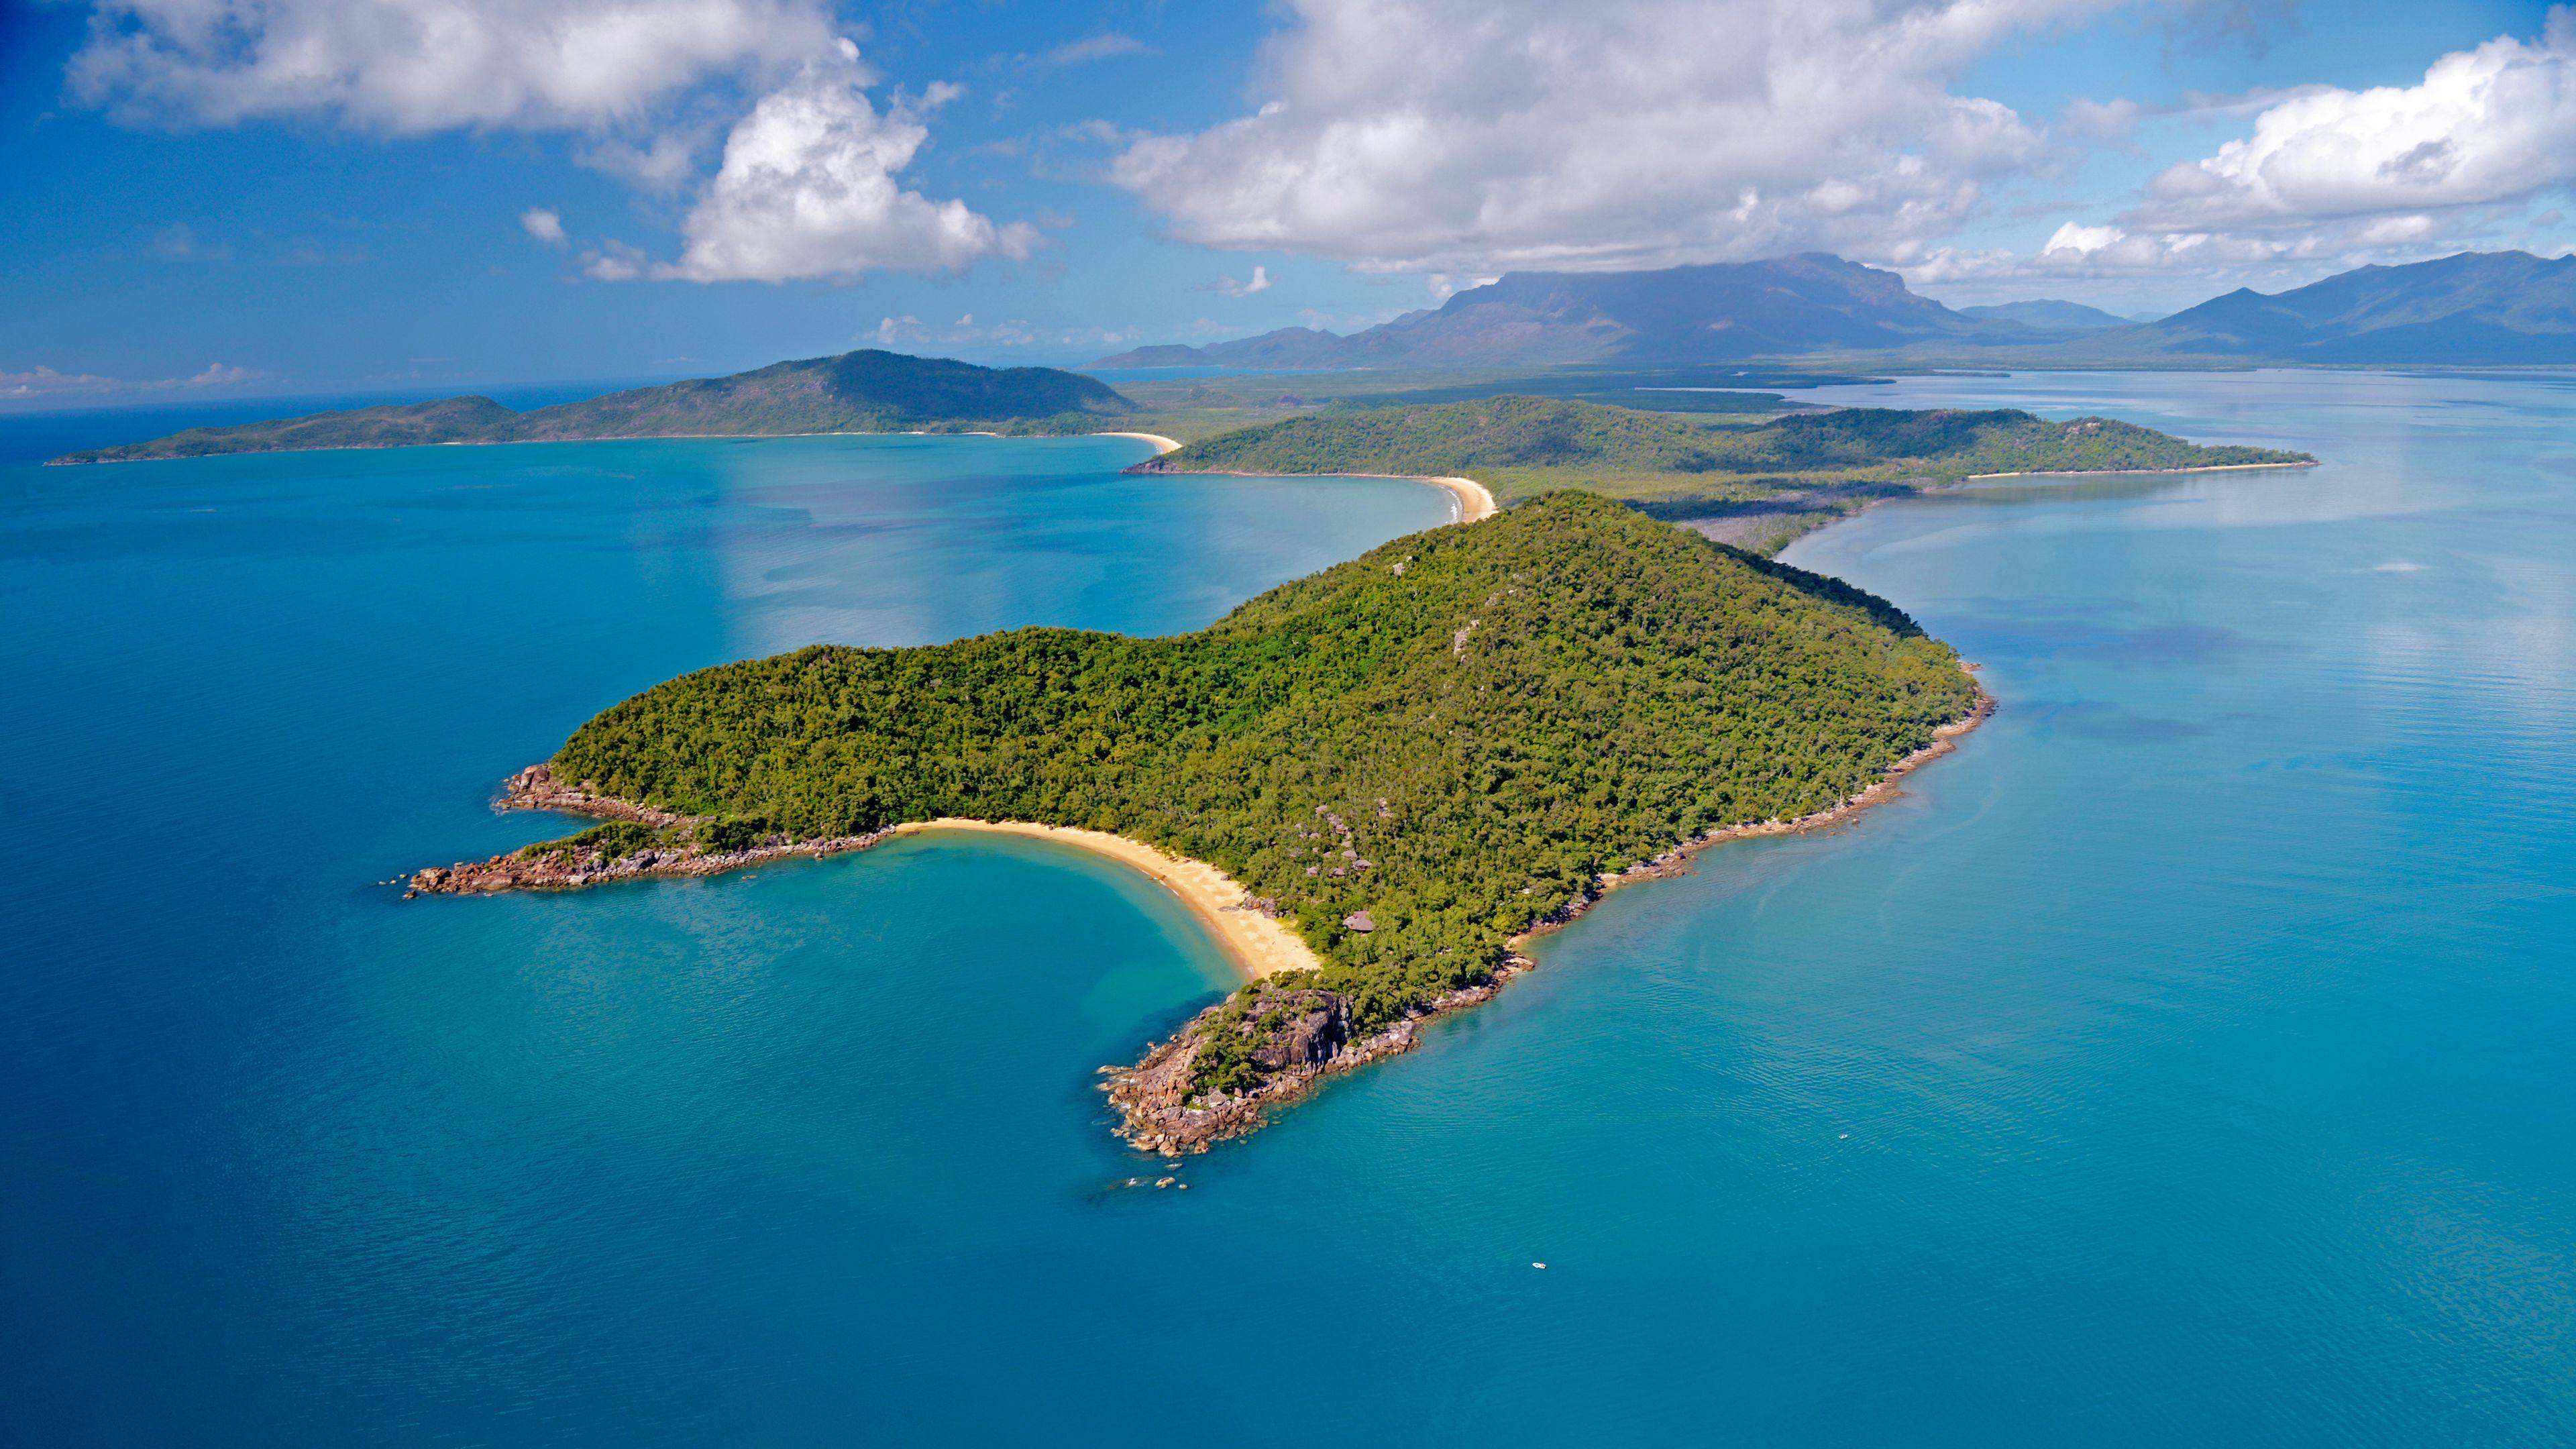 30-Minute Magnetic Island Scenic Flight